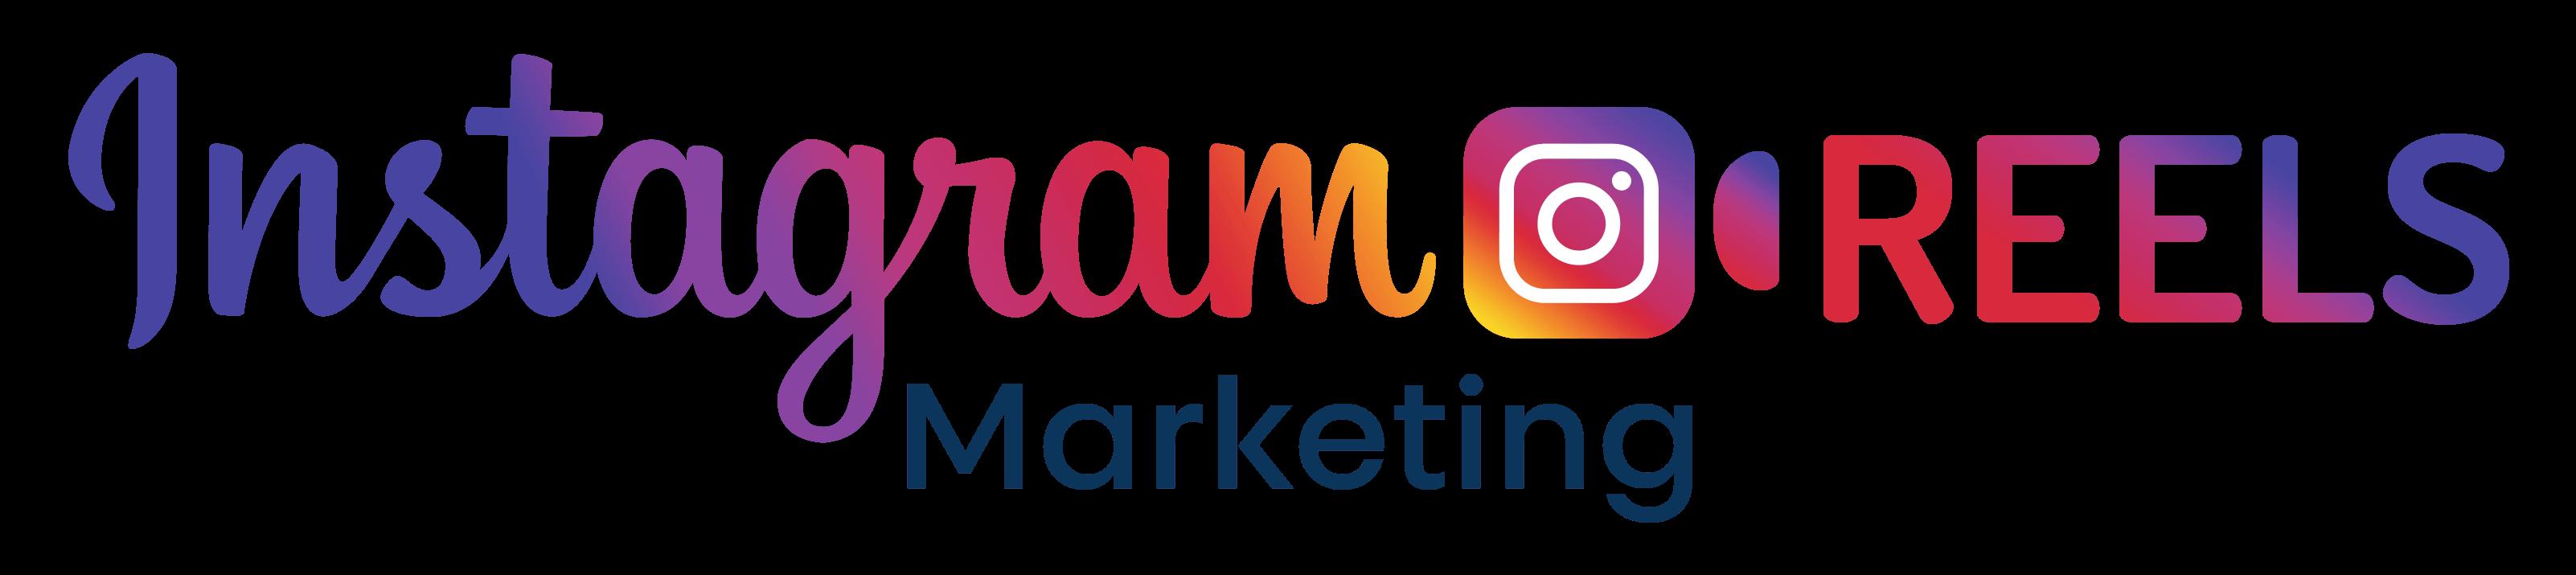 Instagram-Reels-Marketing-Review-Logo